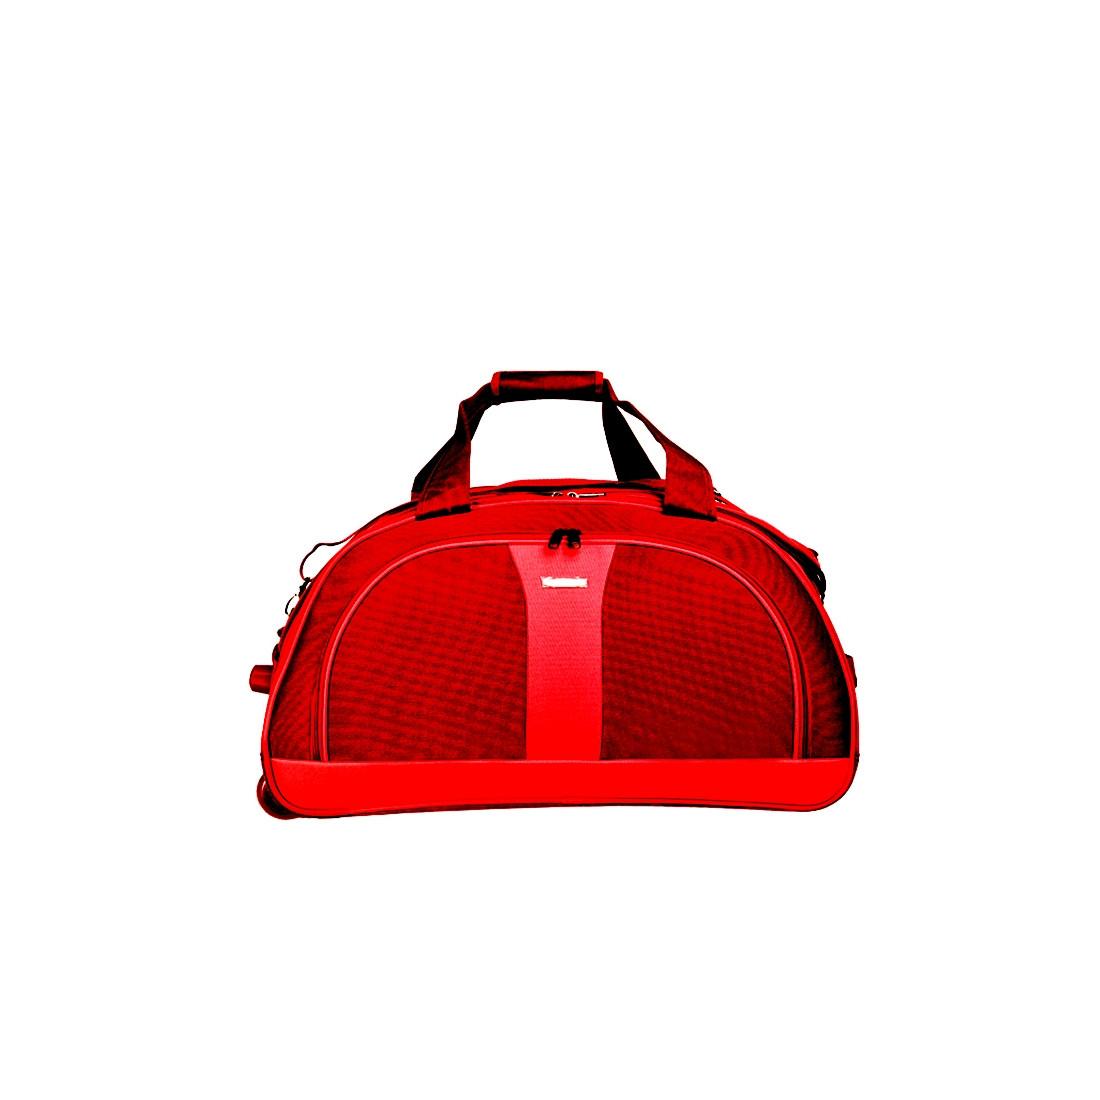 Сумка дорожная на колёсах, бордово-красная MY TRAVEL формованная 50х29х32 см   ксТ400-20бор